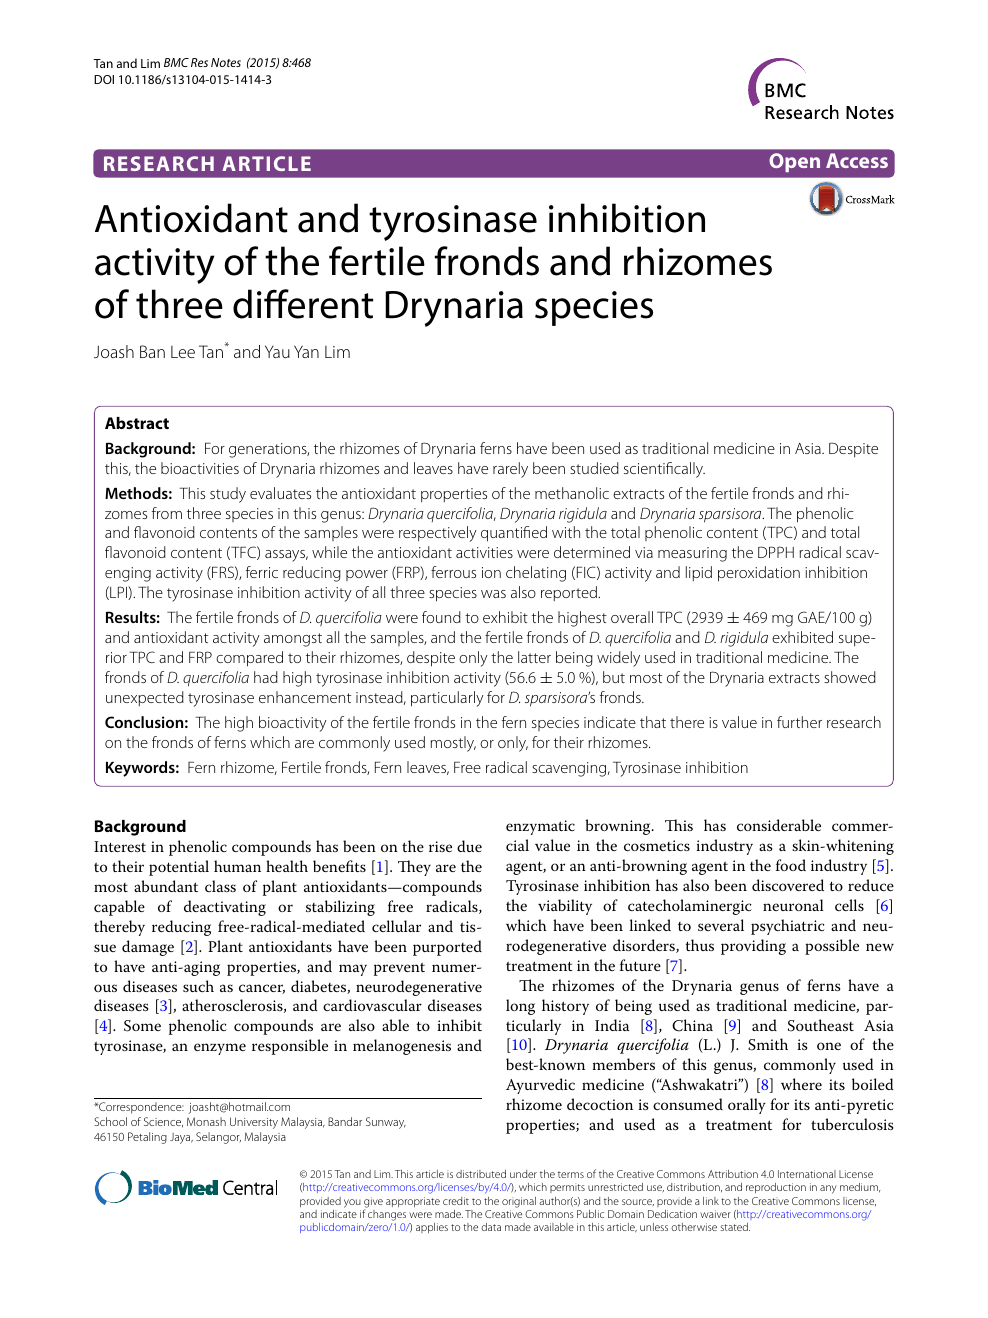 Antioxidant and tyrosinase inhibition activity of the